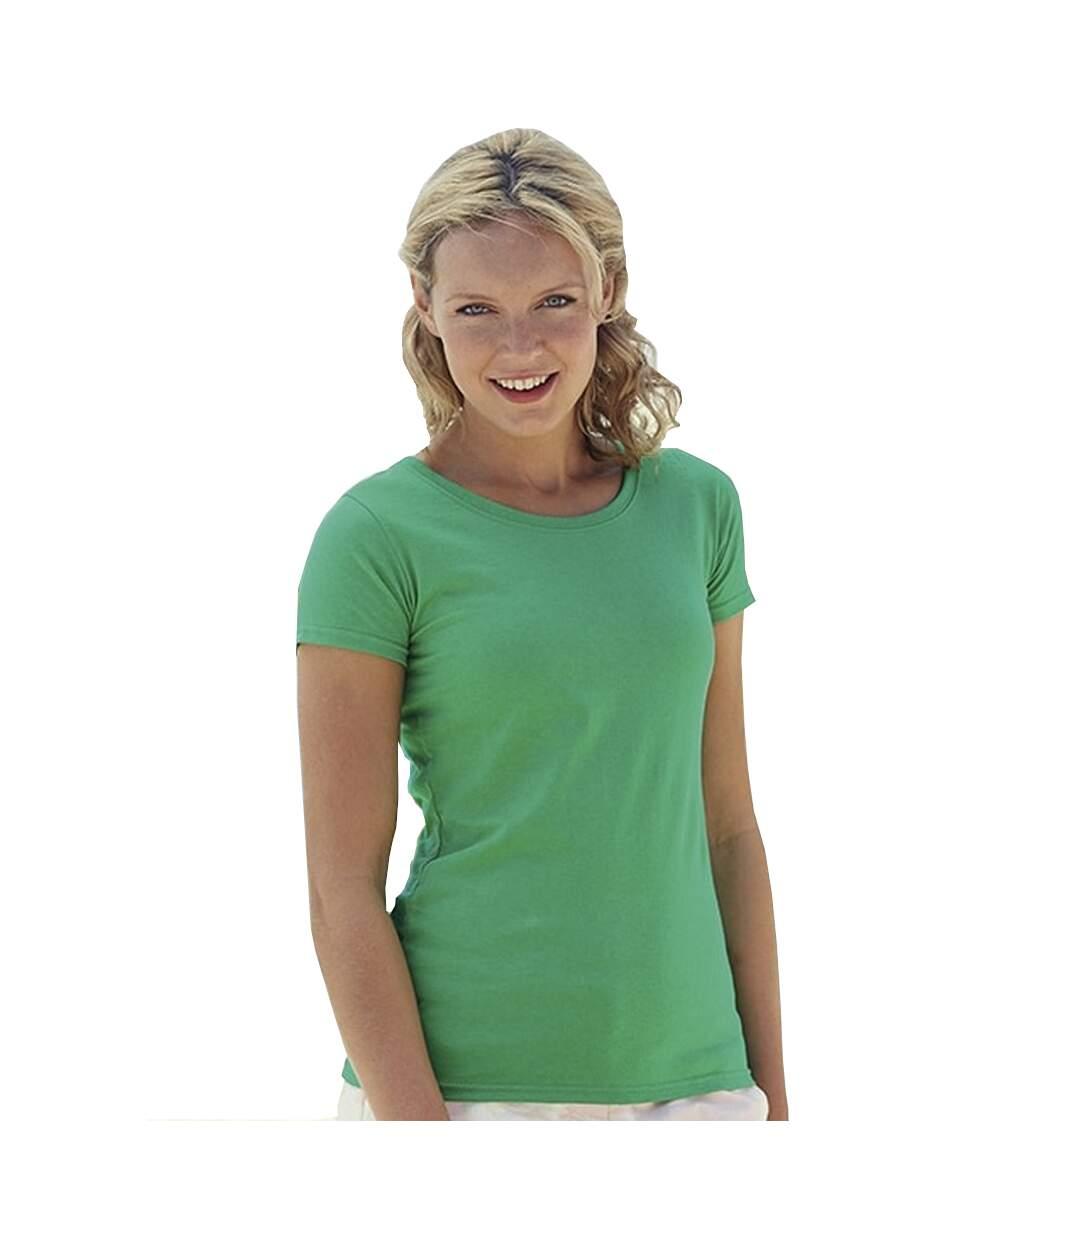 Dégagement Fruit Of The Loom T-Shirt Manches Courtes Femme Rose clair UTBC1354 dsf.d455nksdKLFHG